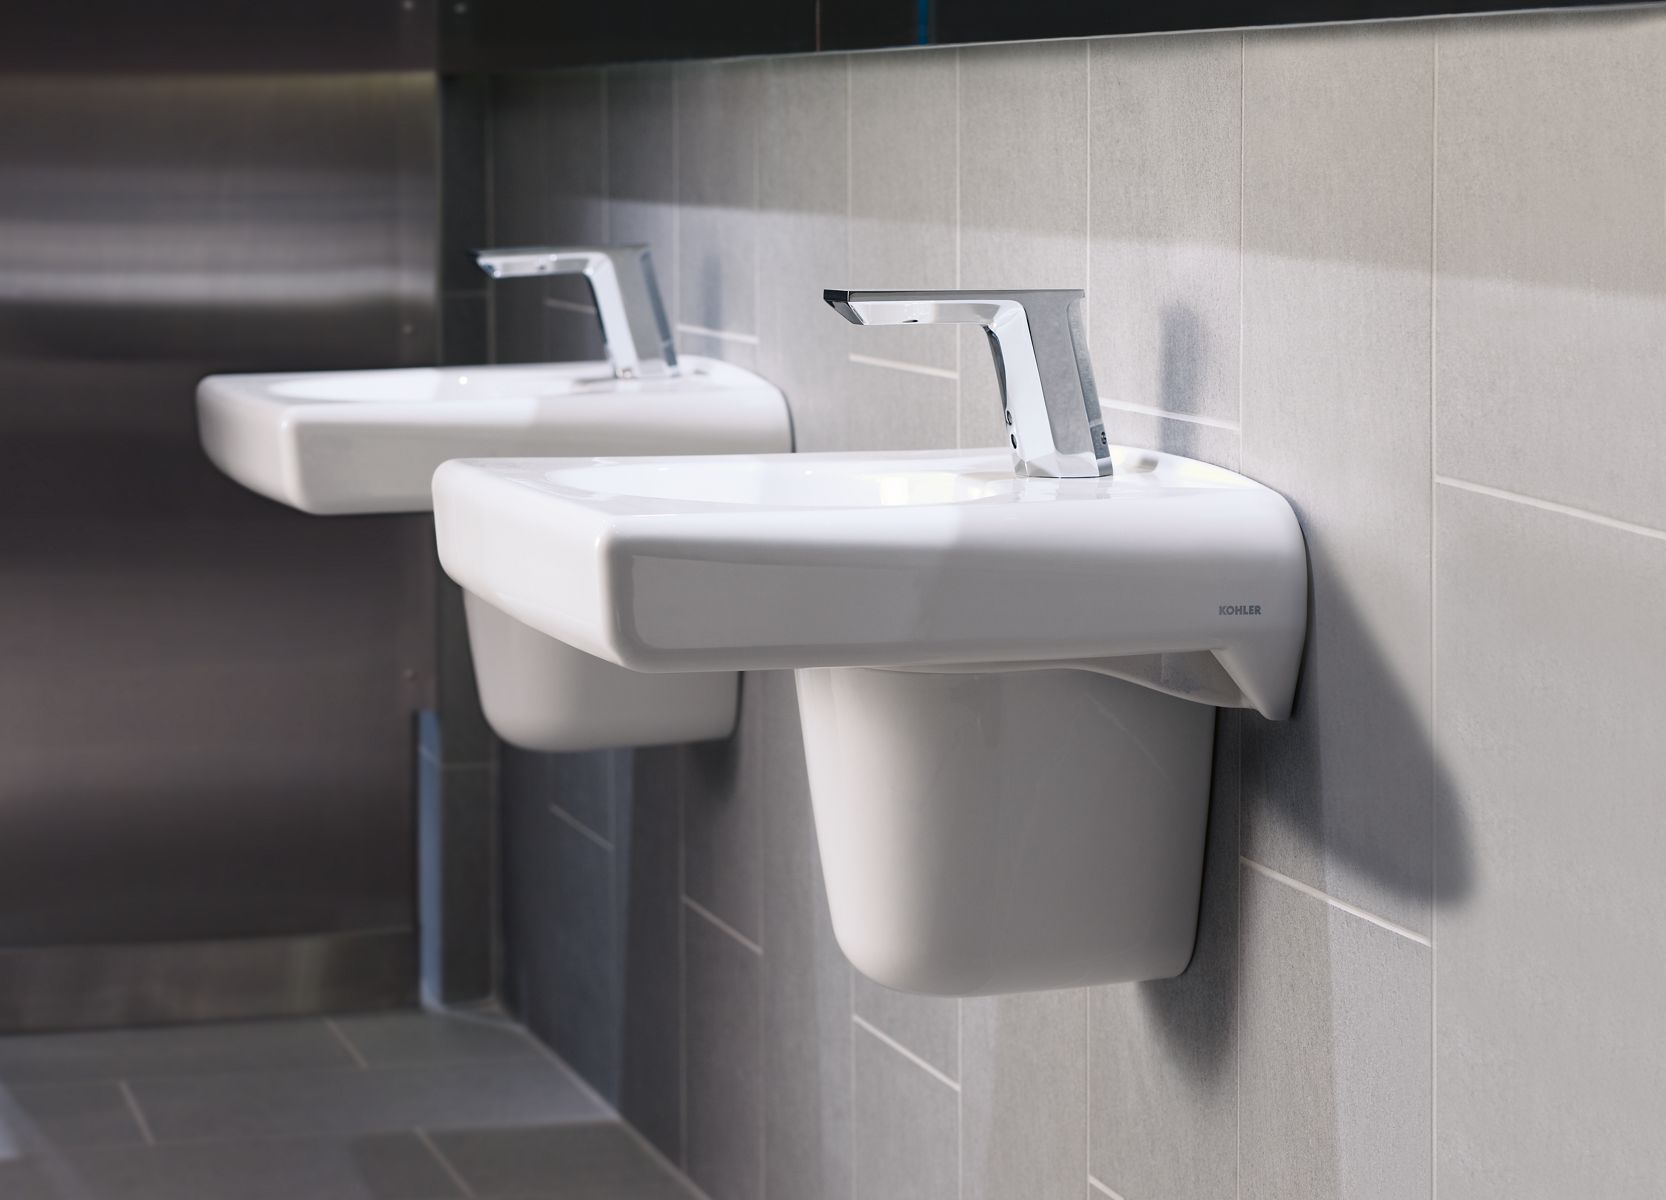 ada compliant products  kohler, Bathroom decor